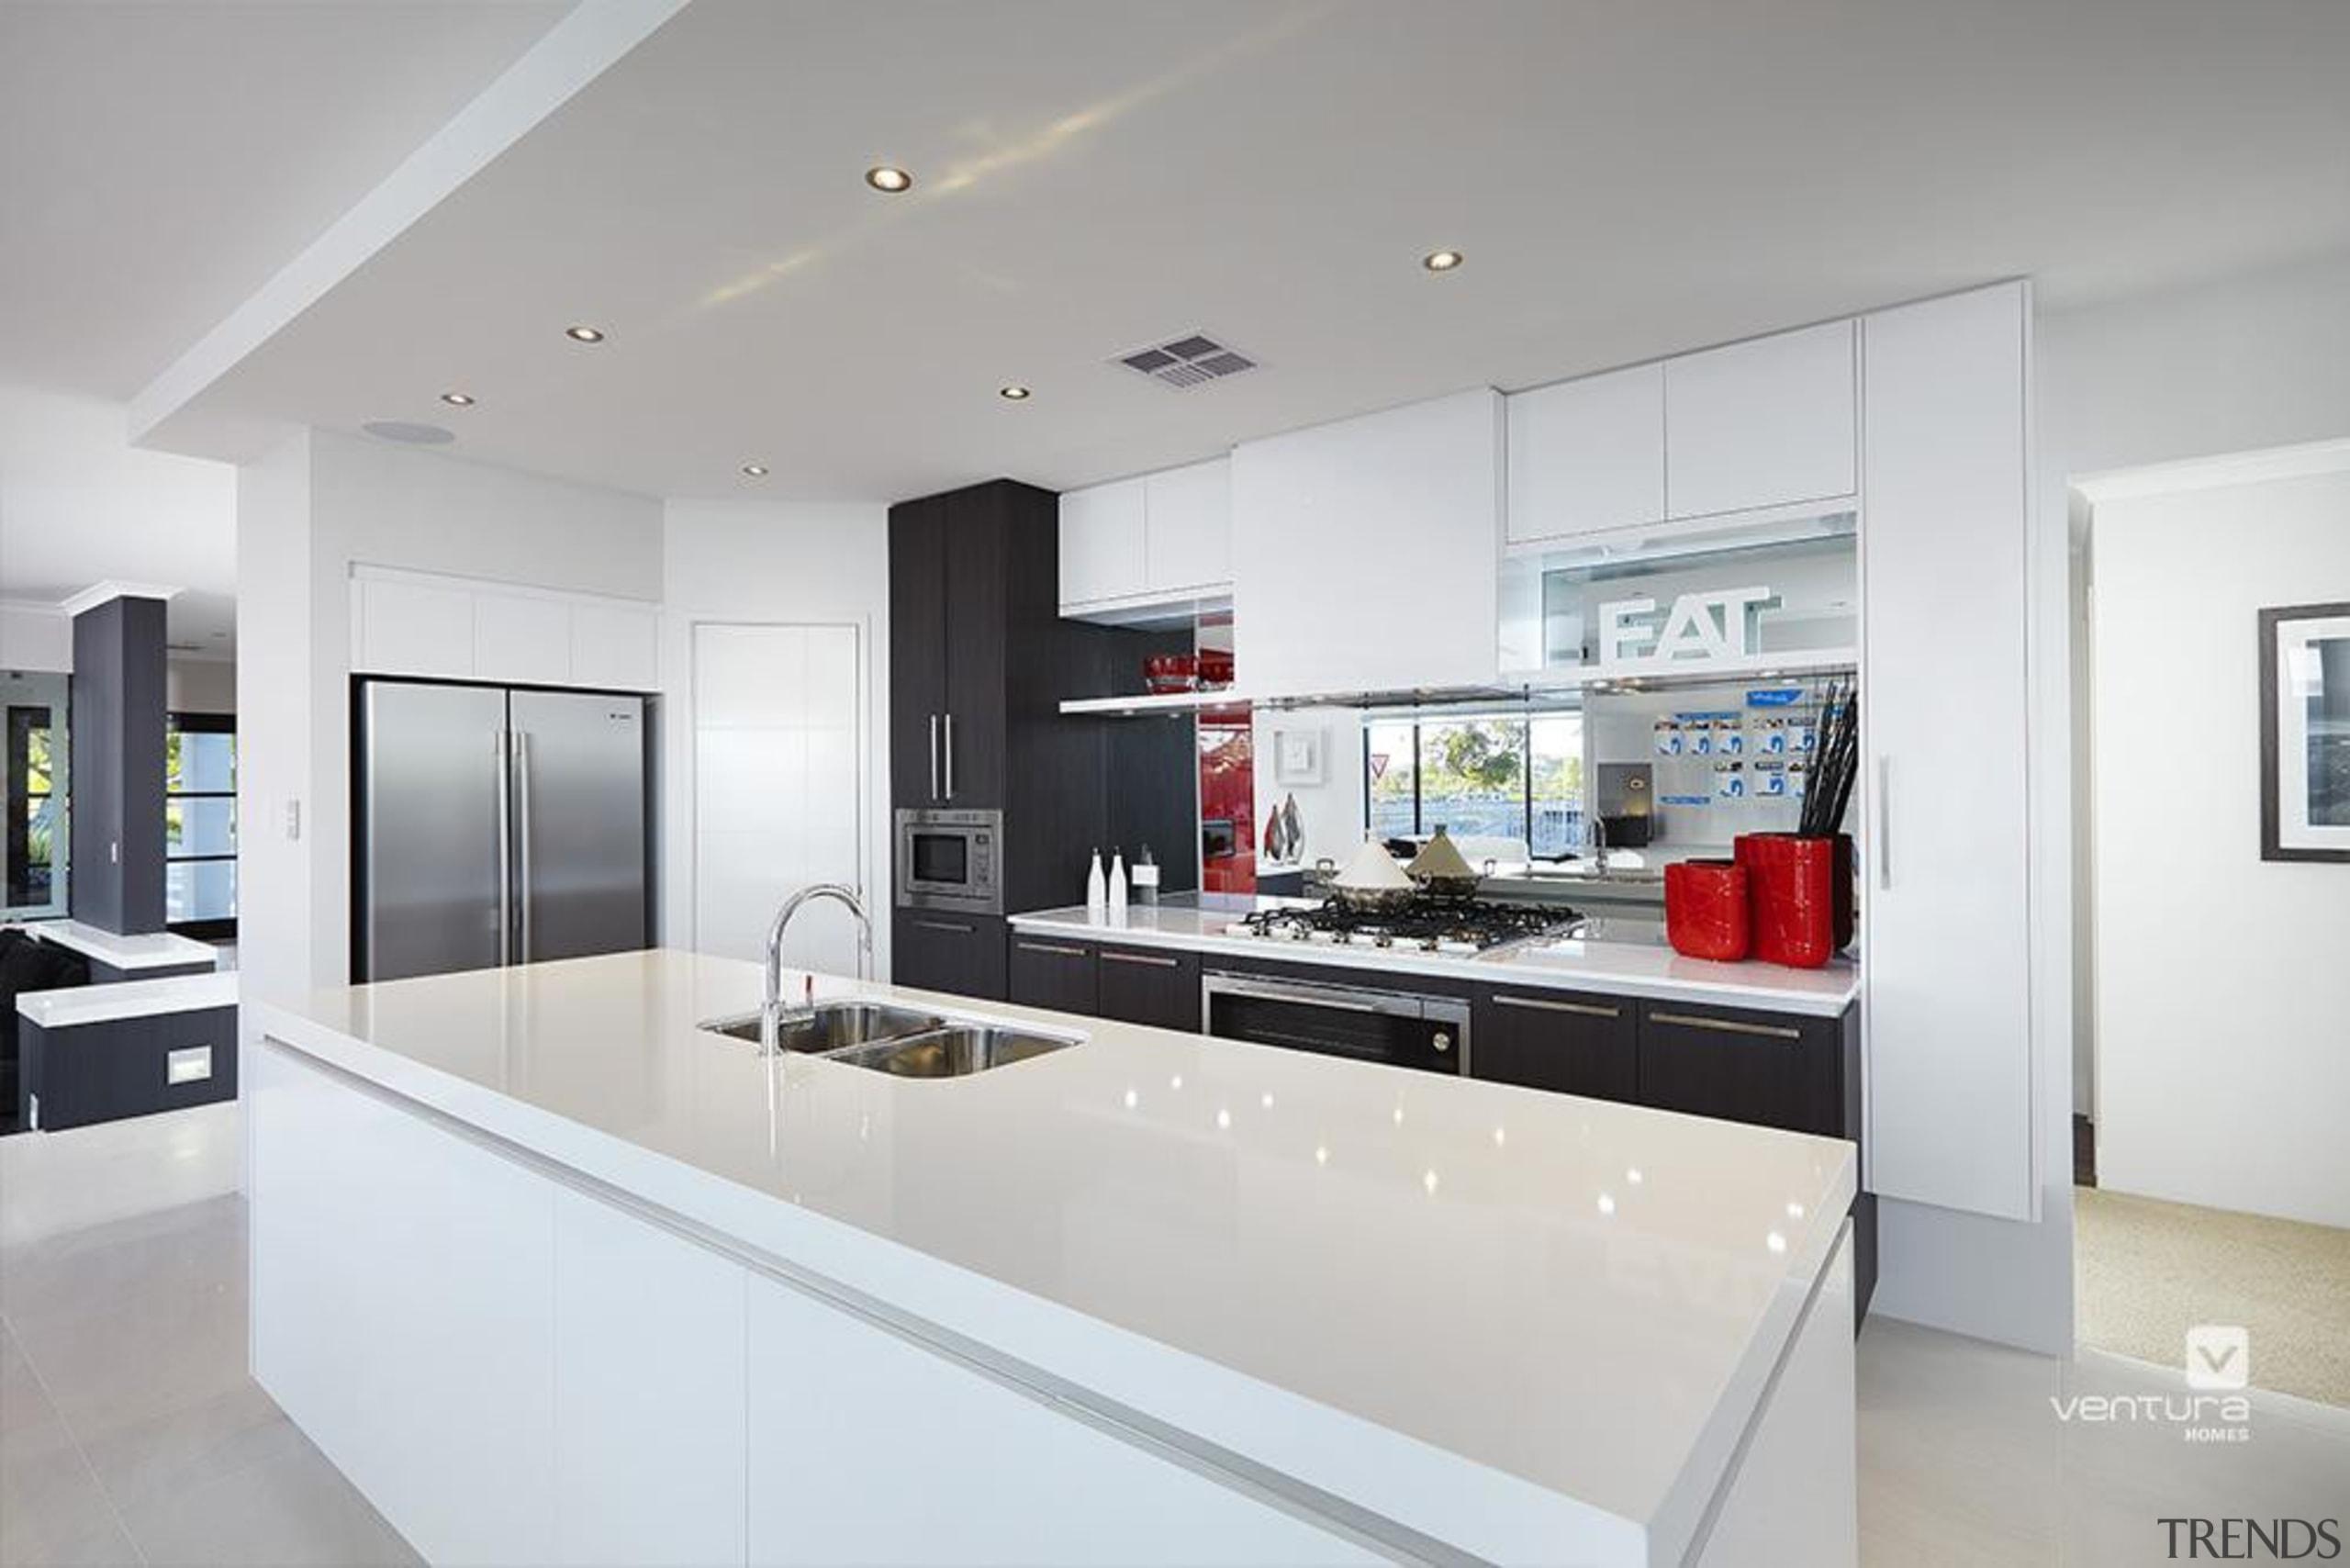 Kitchen design. - The Montrose Display Home - countertop, interior design, kitchen, real estate, gray, white